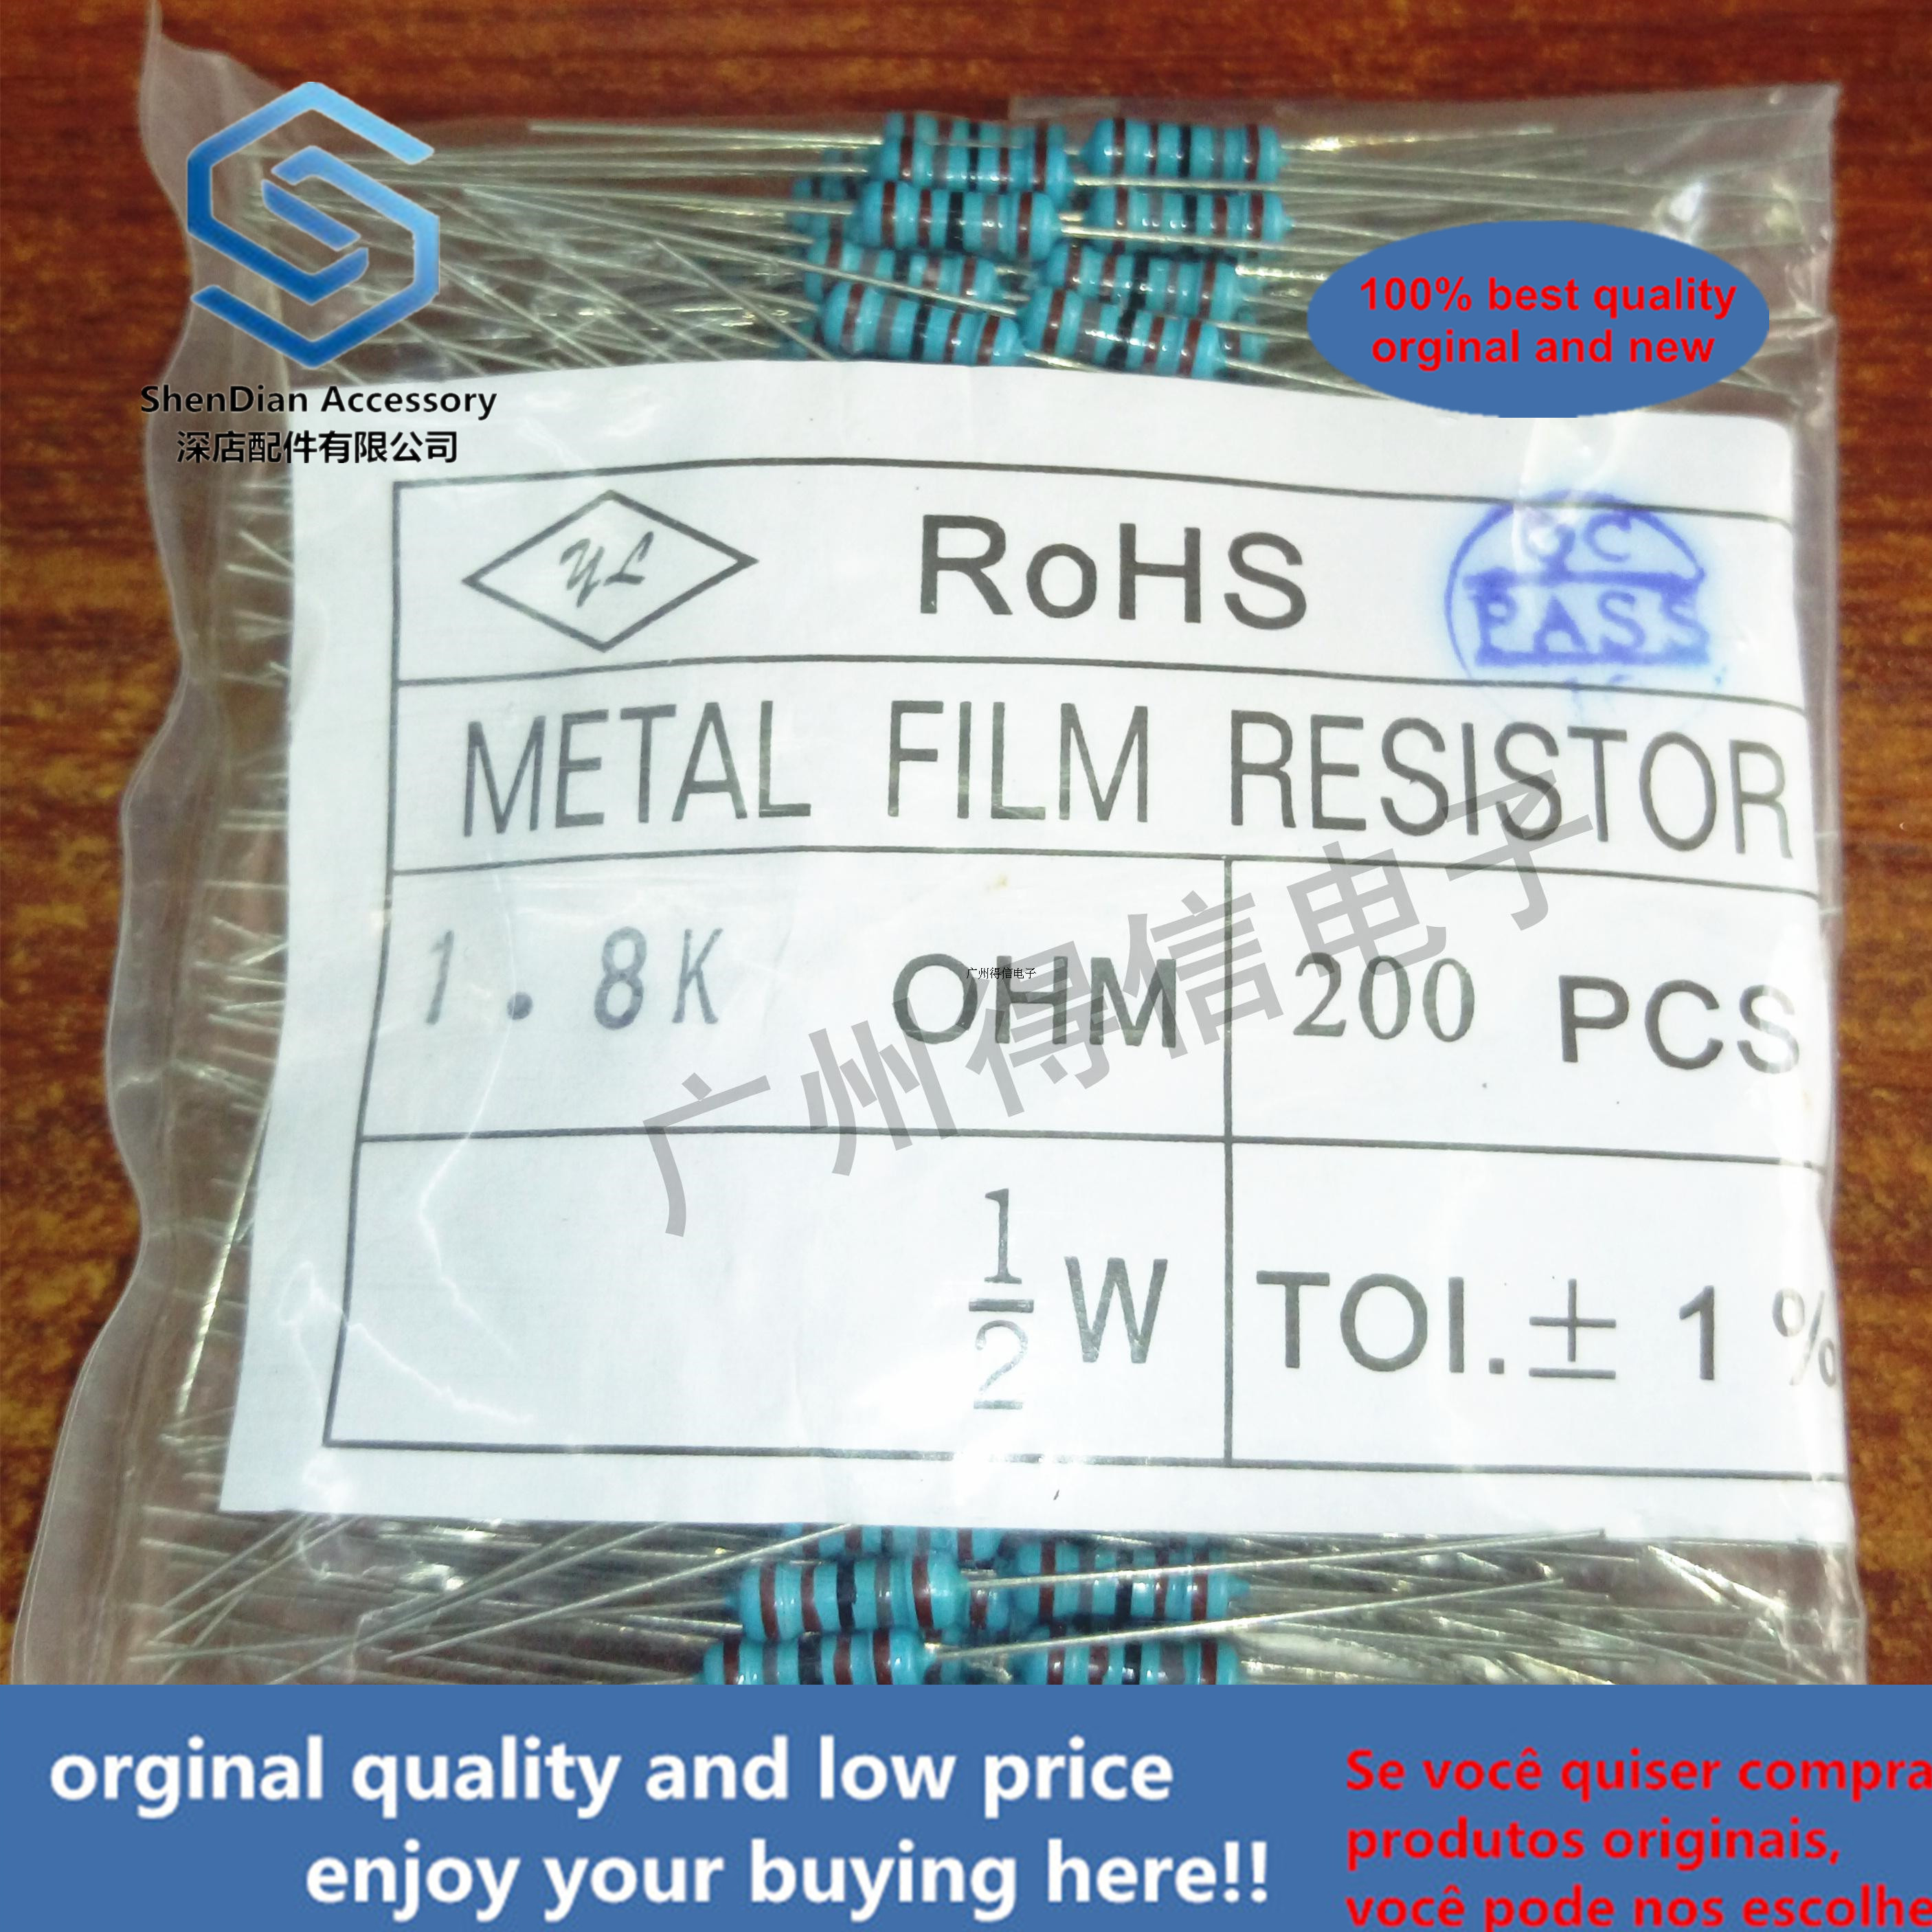 200pcs 1 / 2W 7.5R 7.5 Euro 1% Brand New Metal Film Iron Feet Resistor Bag 200 Pcs Per Pack